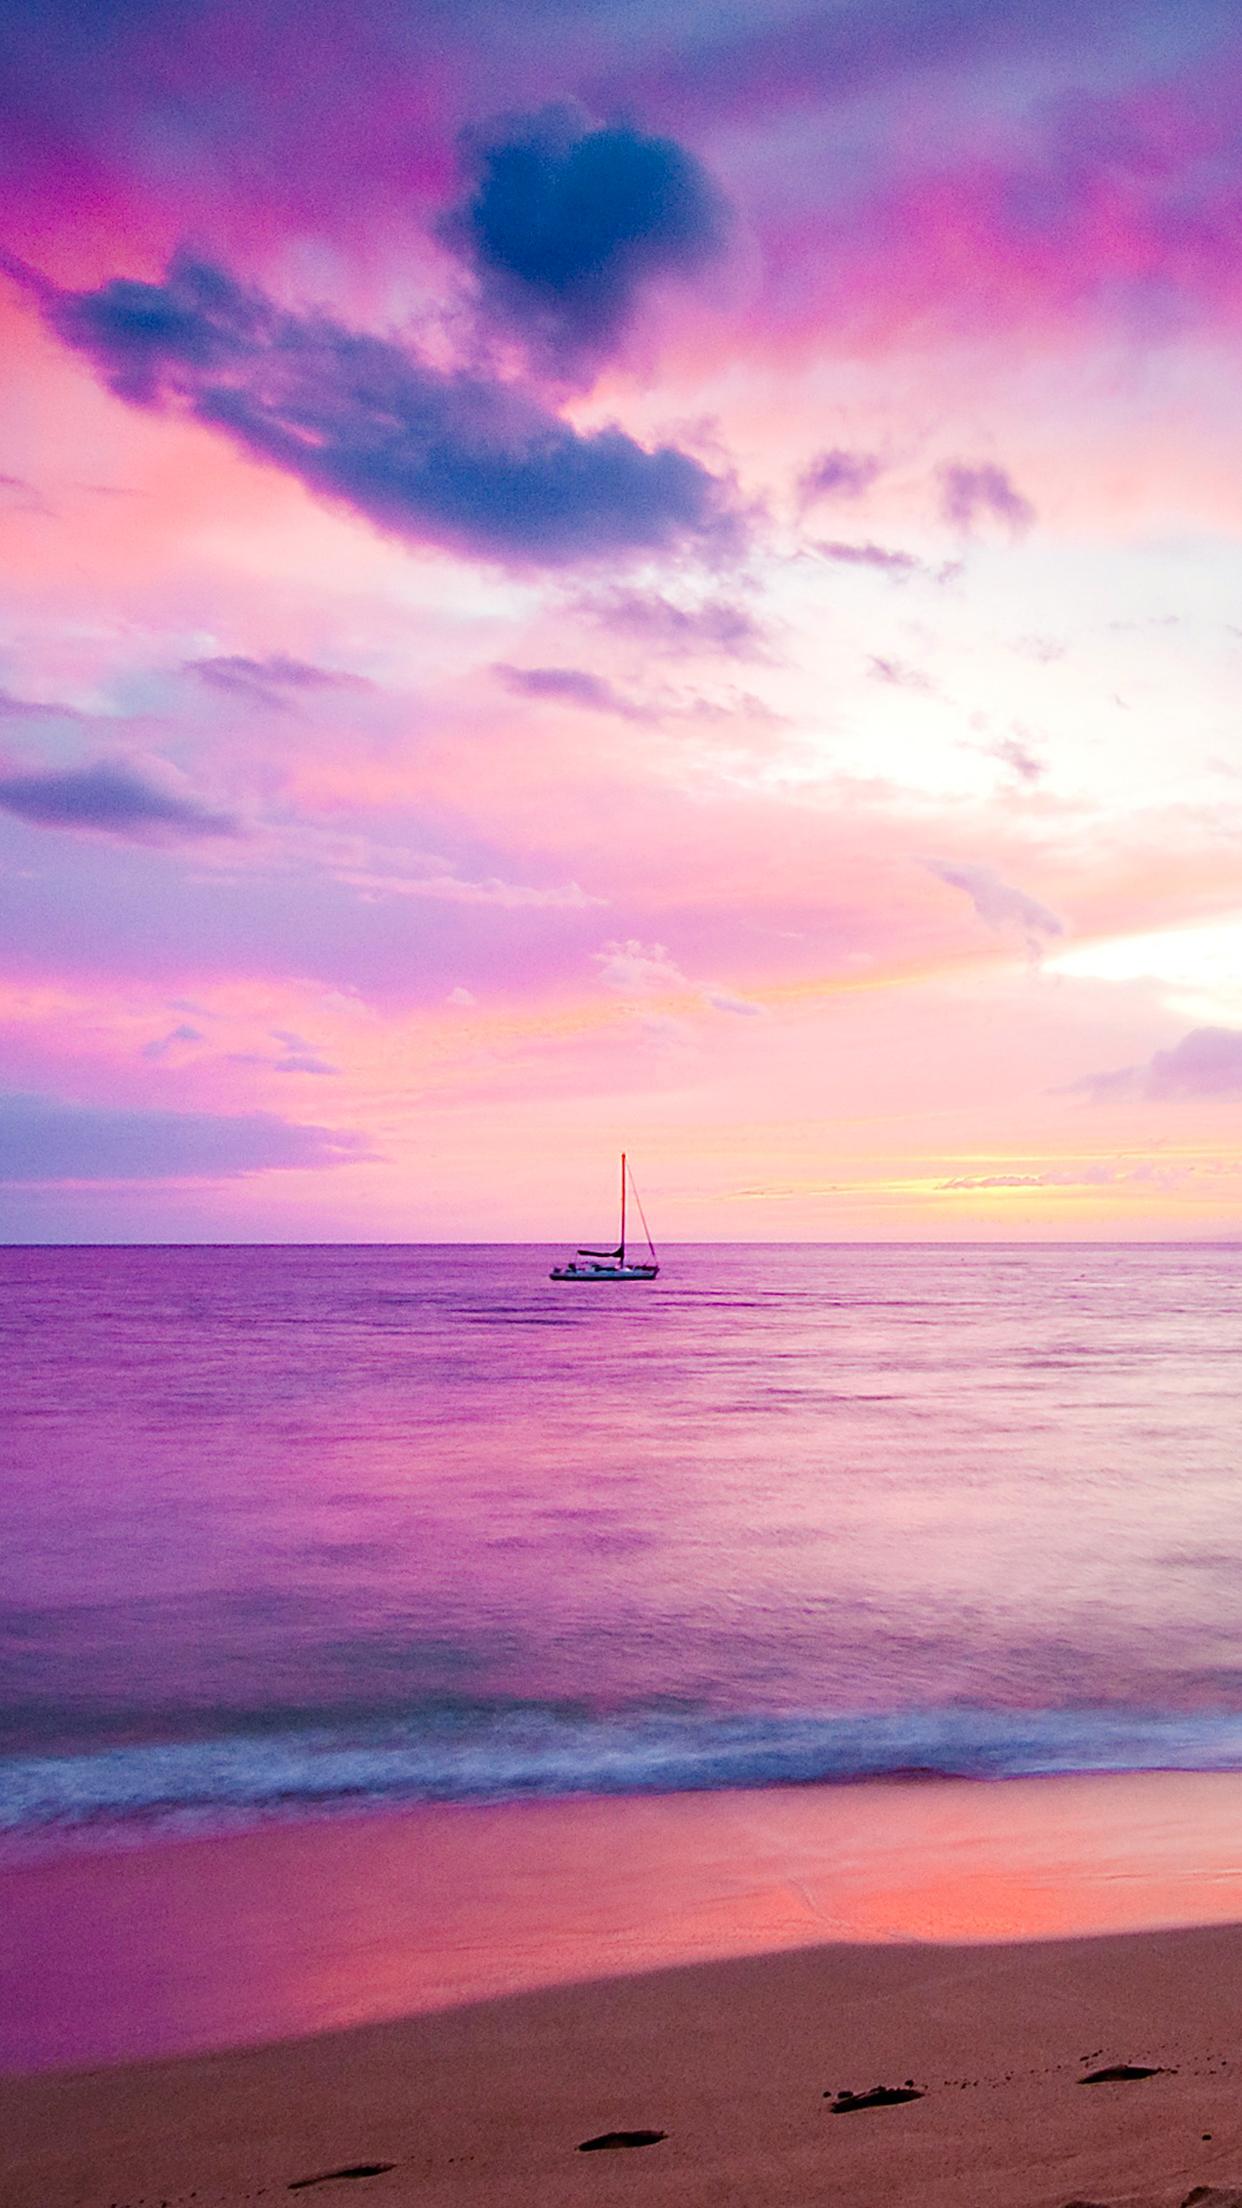 Lavender Seashore 3Wallpapers iPhone Parallax Lavender Seashore